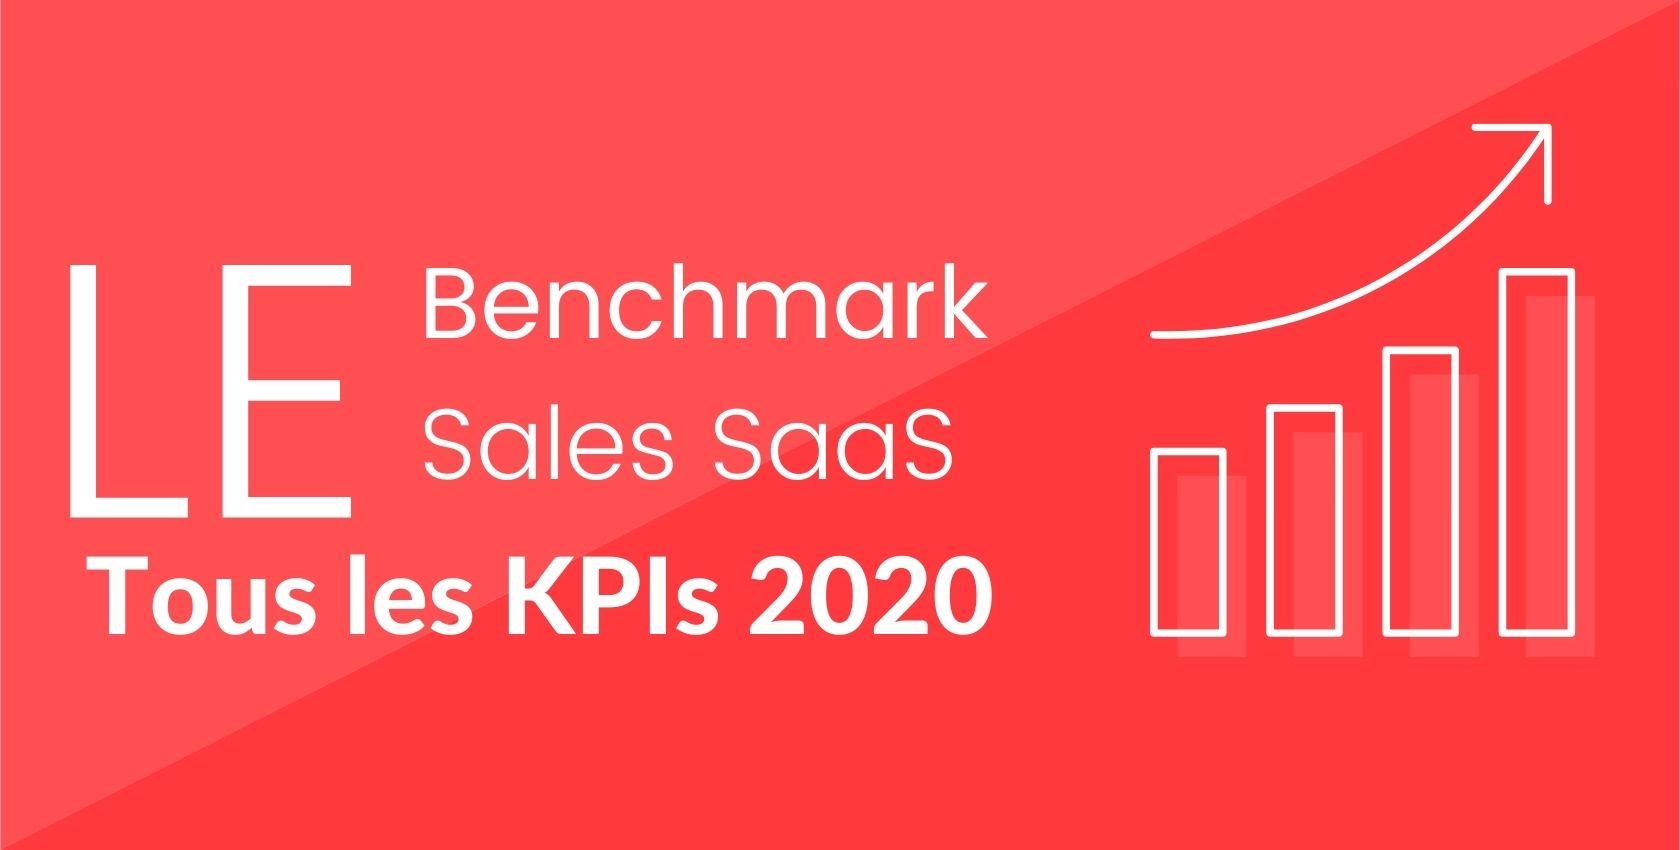 Benchmark SaaS France Commercial B2B